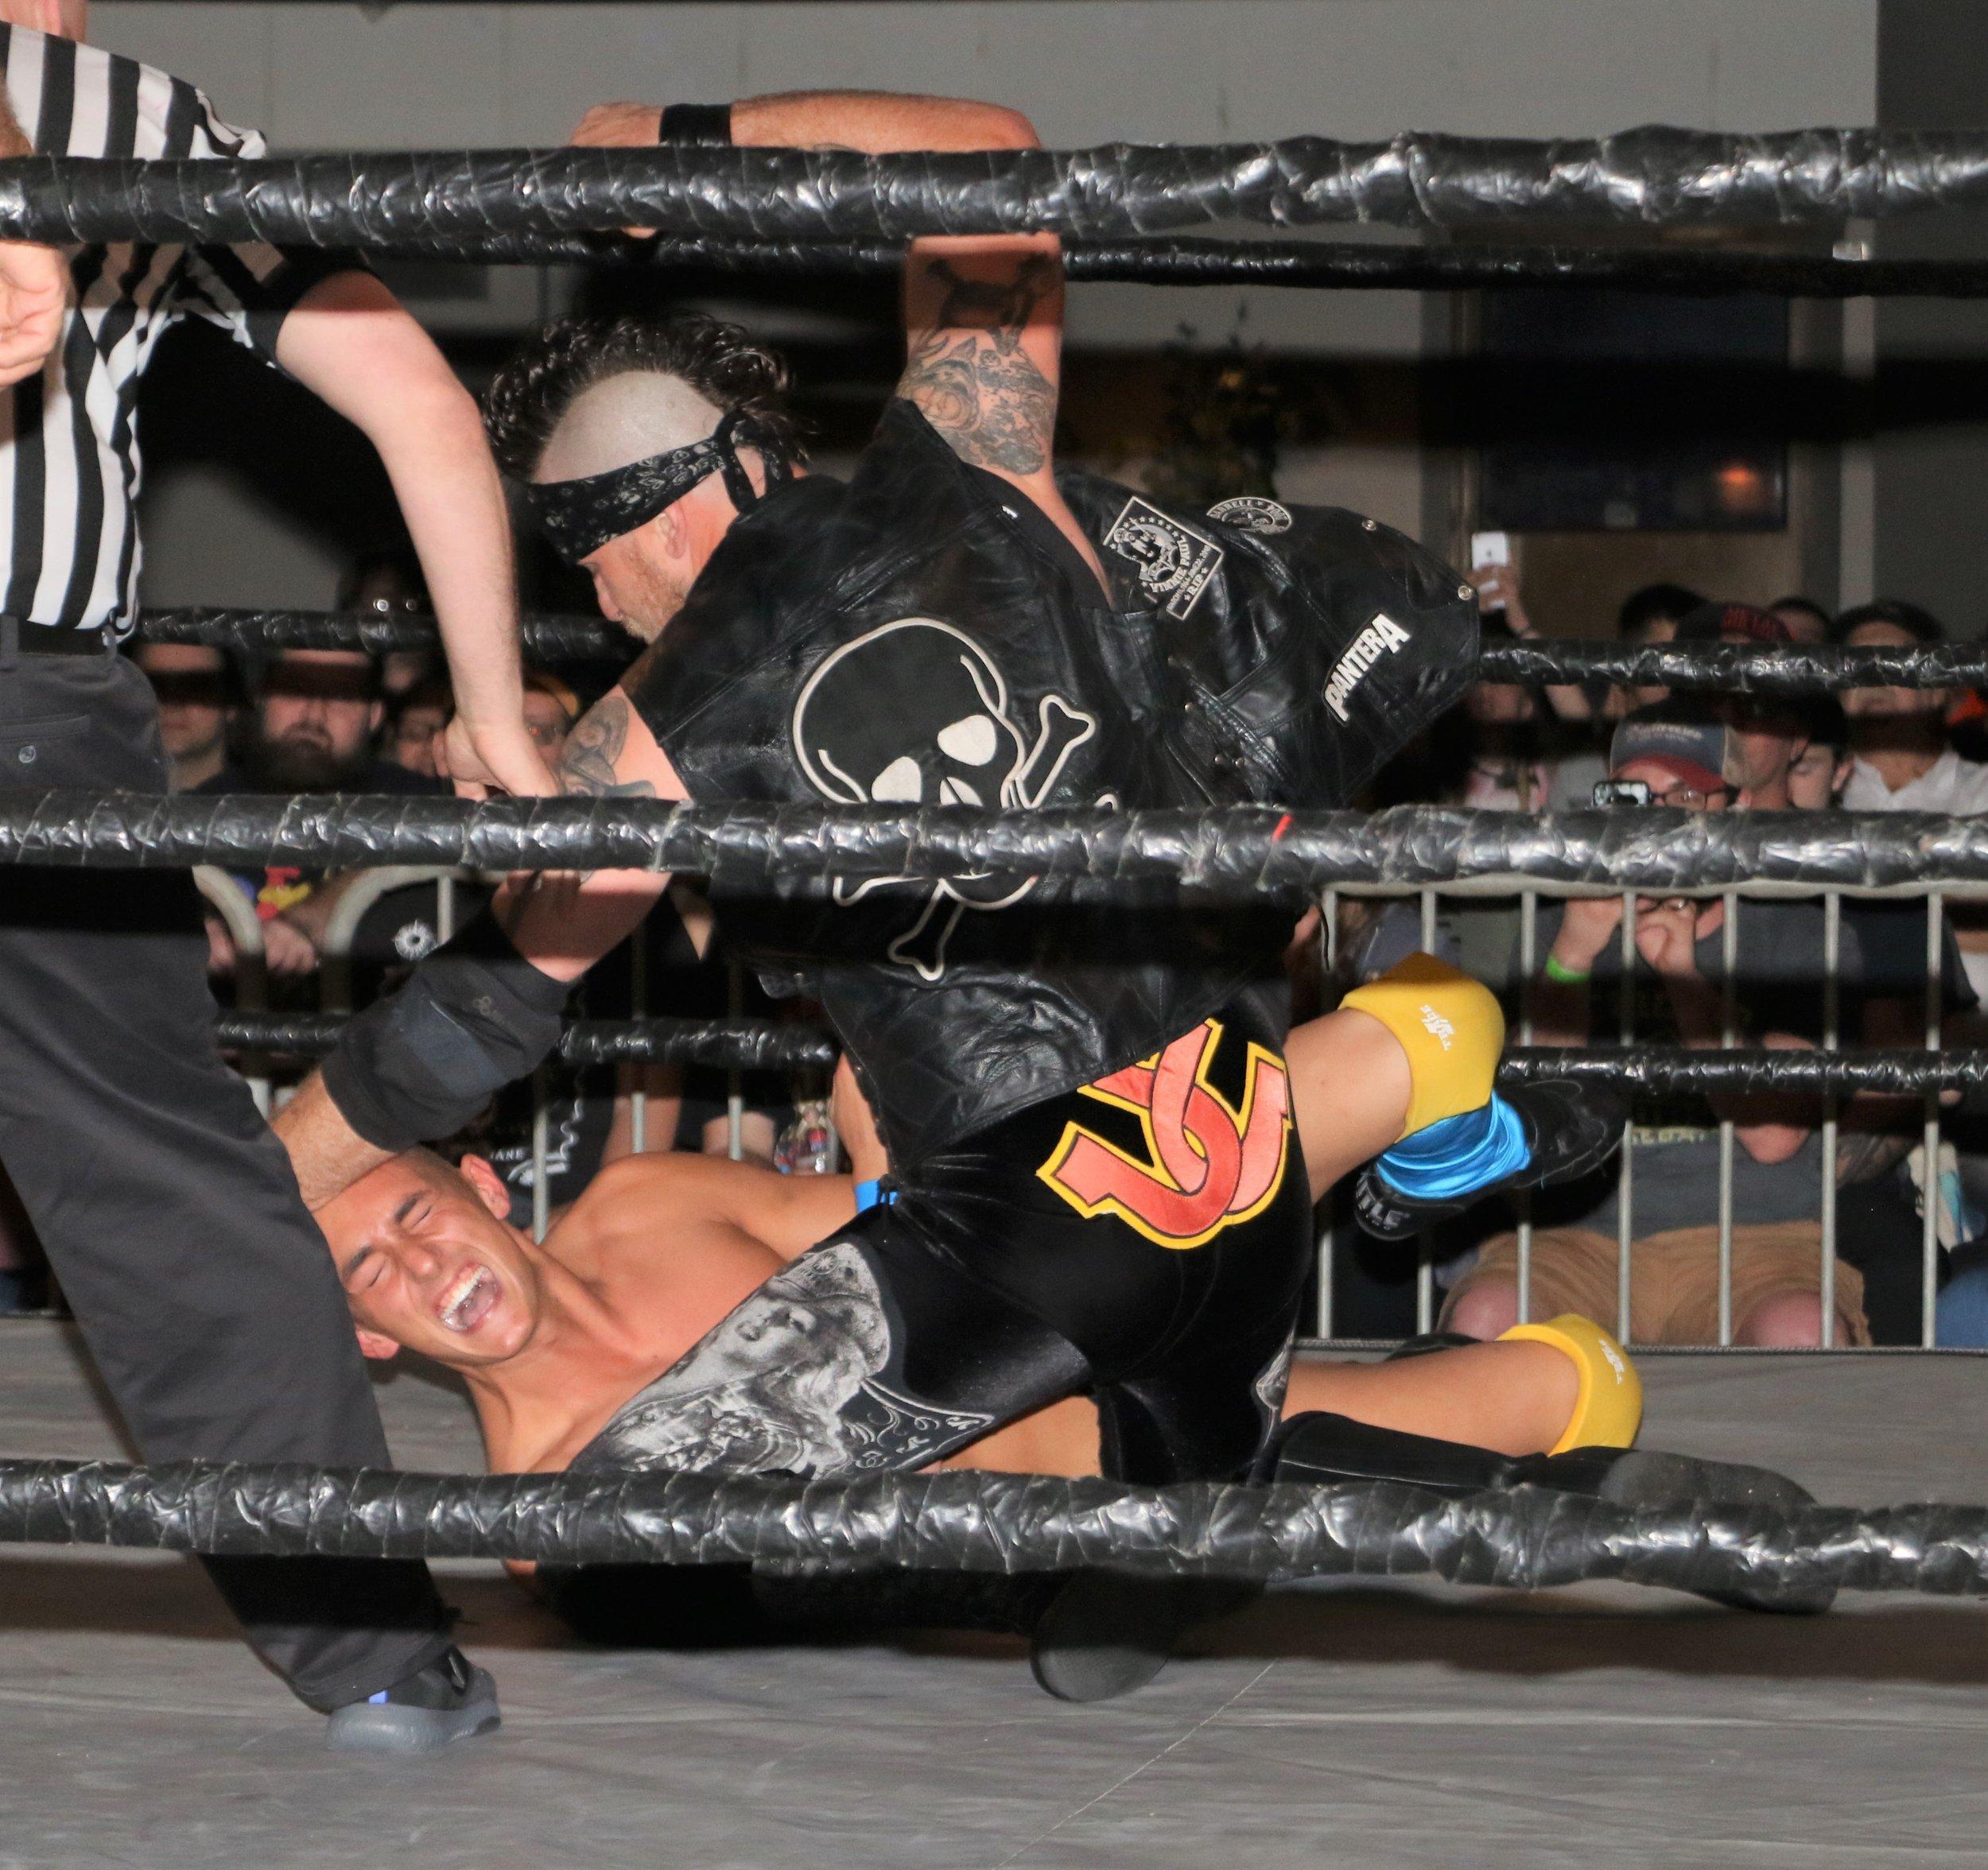 Ruff Crossing pummels Jordan Kross during the six-man tag team match.